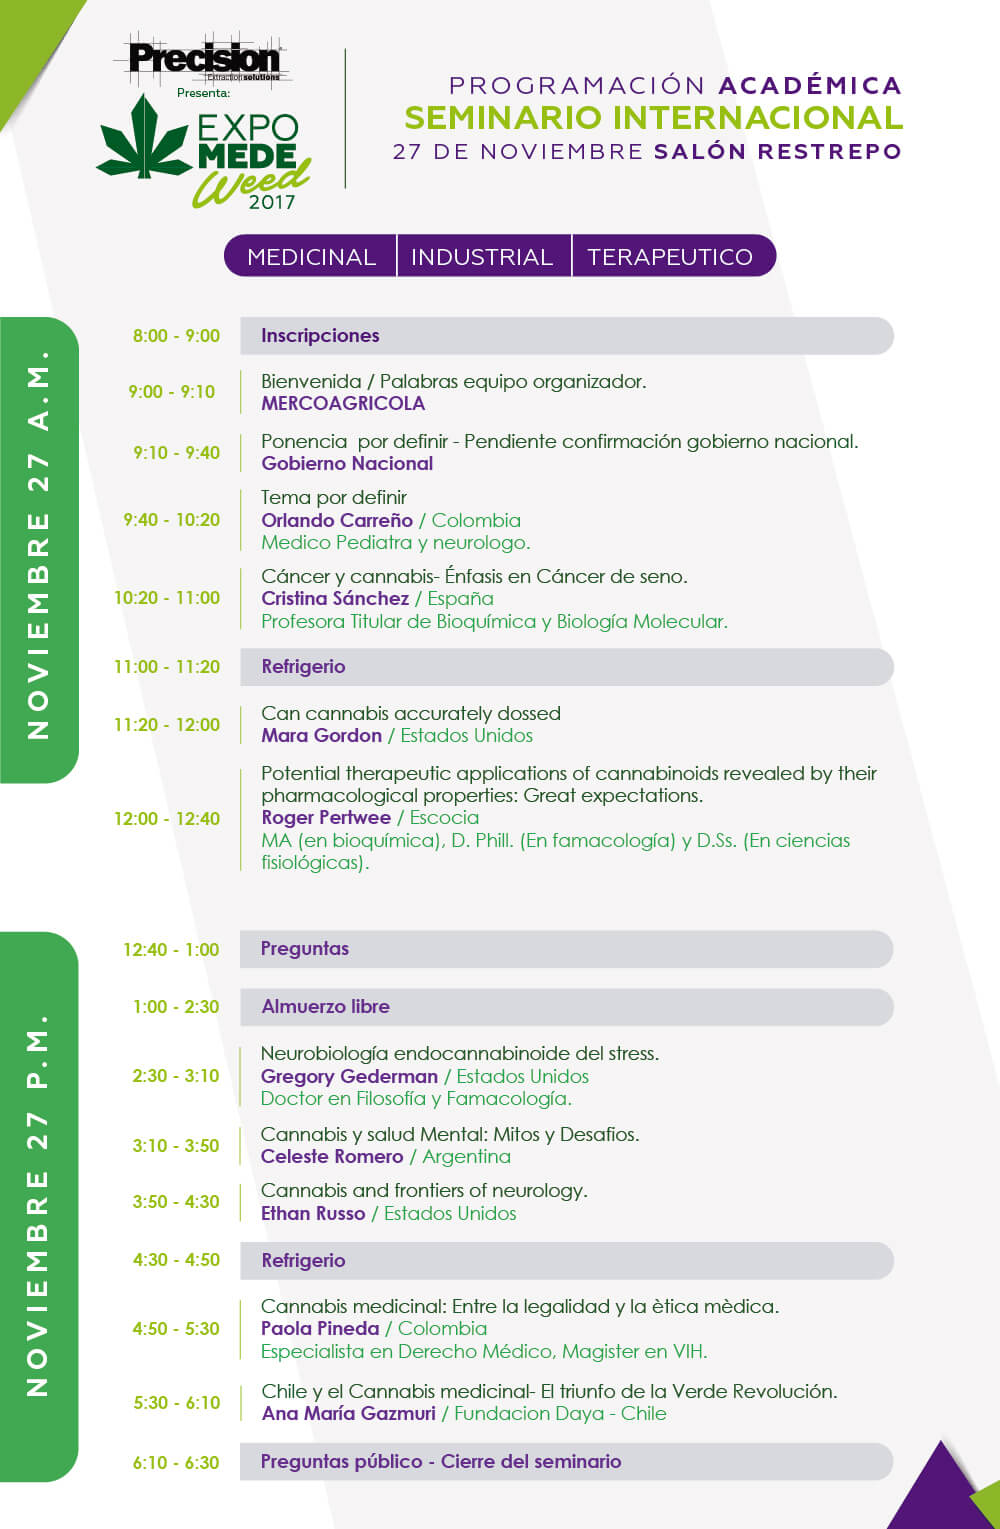 Seminar programme